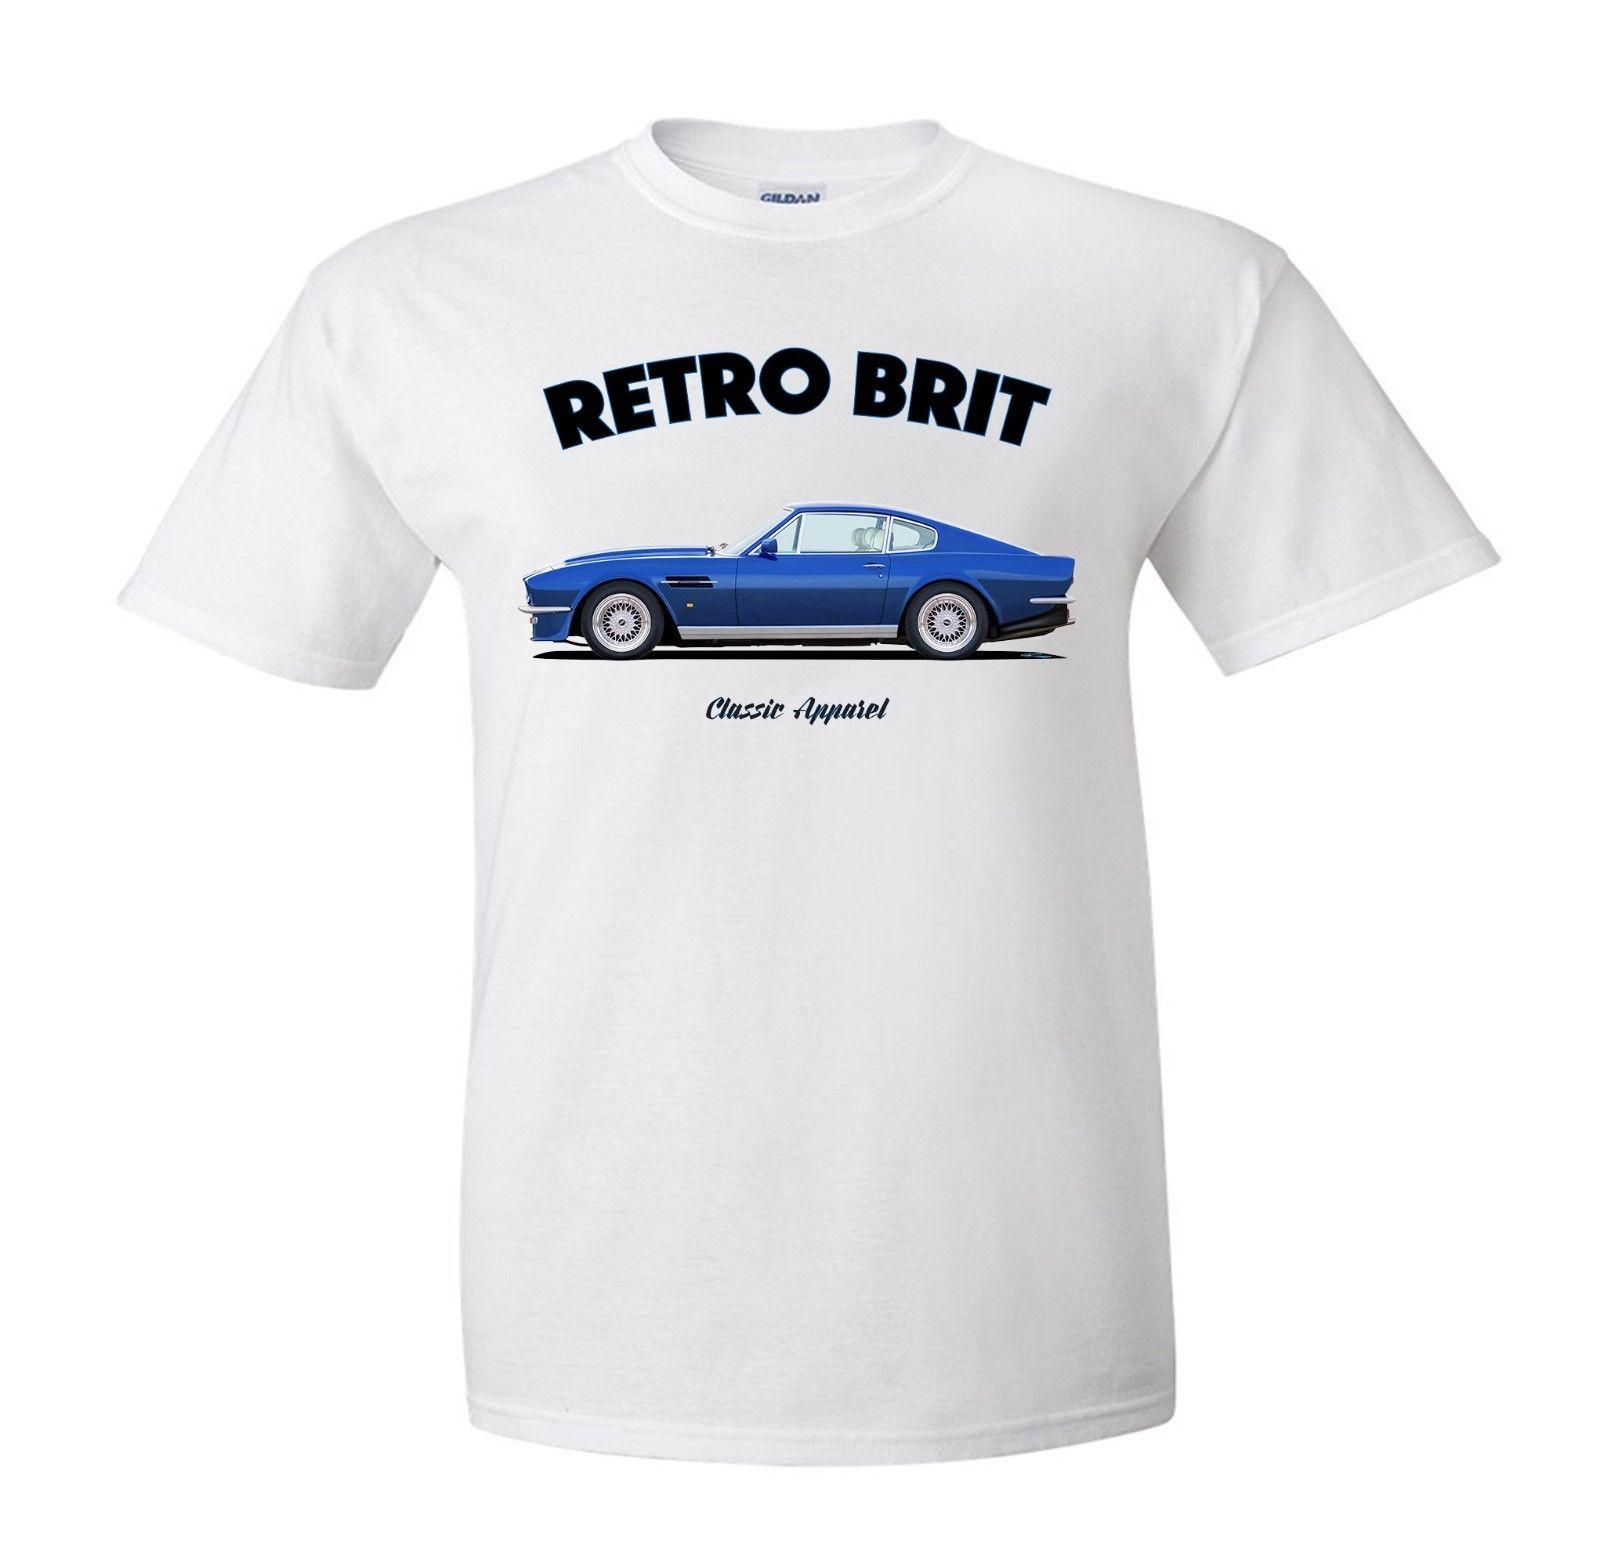 Aston Martin Dbs Vantage Volante T Shirt Retro Brit Classic Car - Aston martin apparel